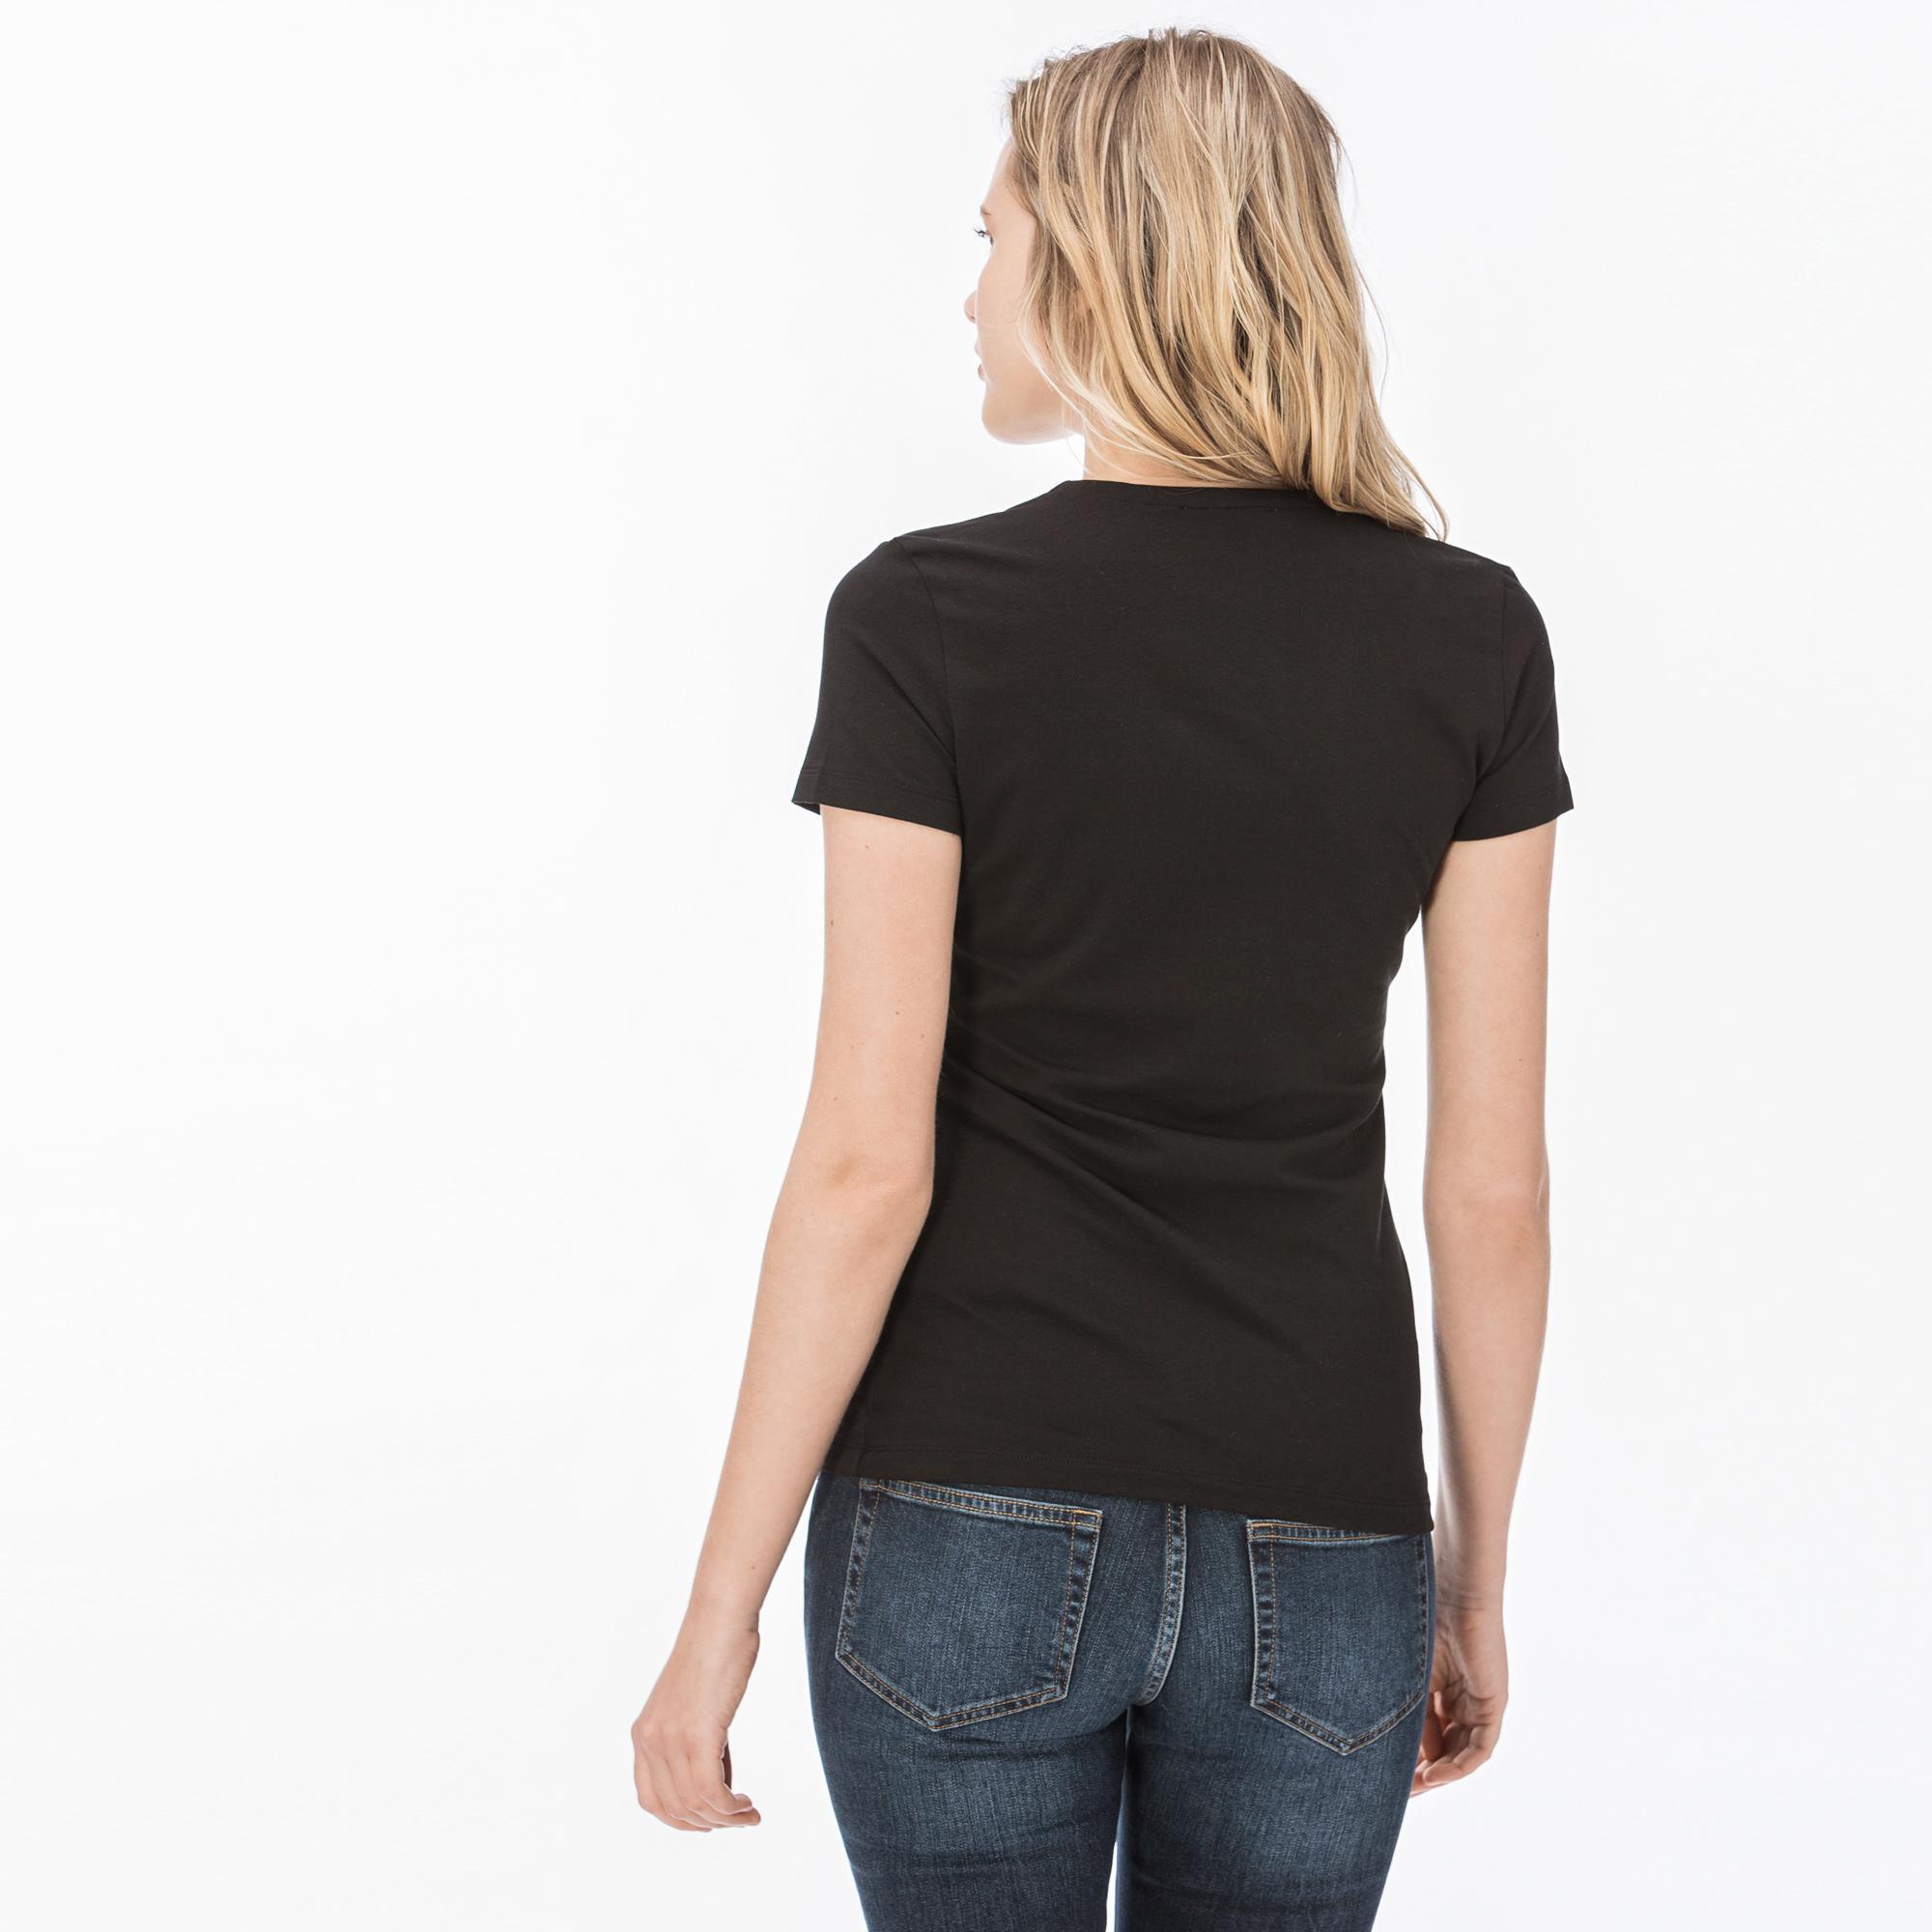 Lacoste Women's V Neck Slim Fit T-Shirt